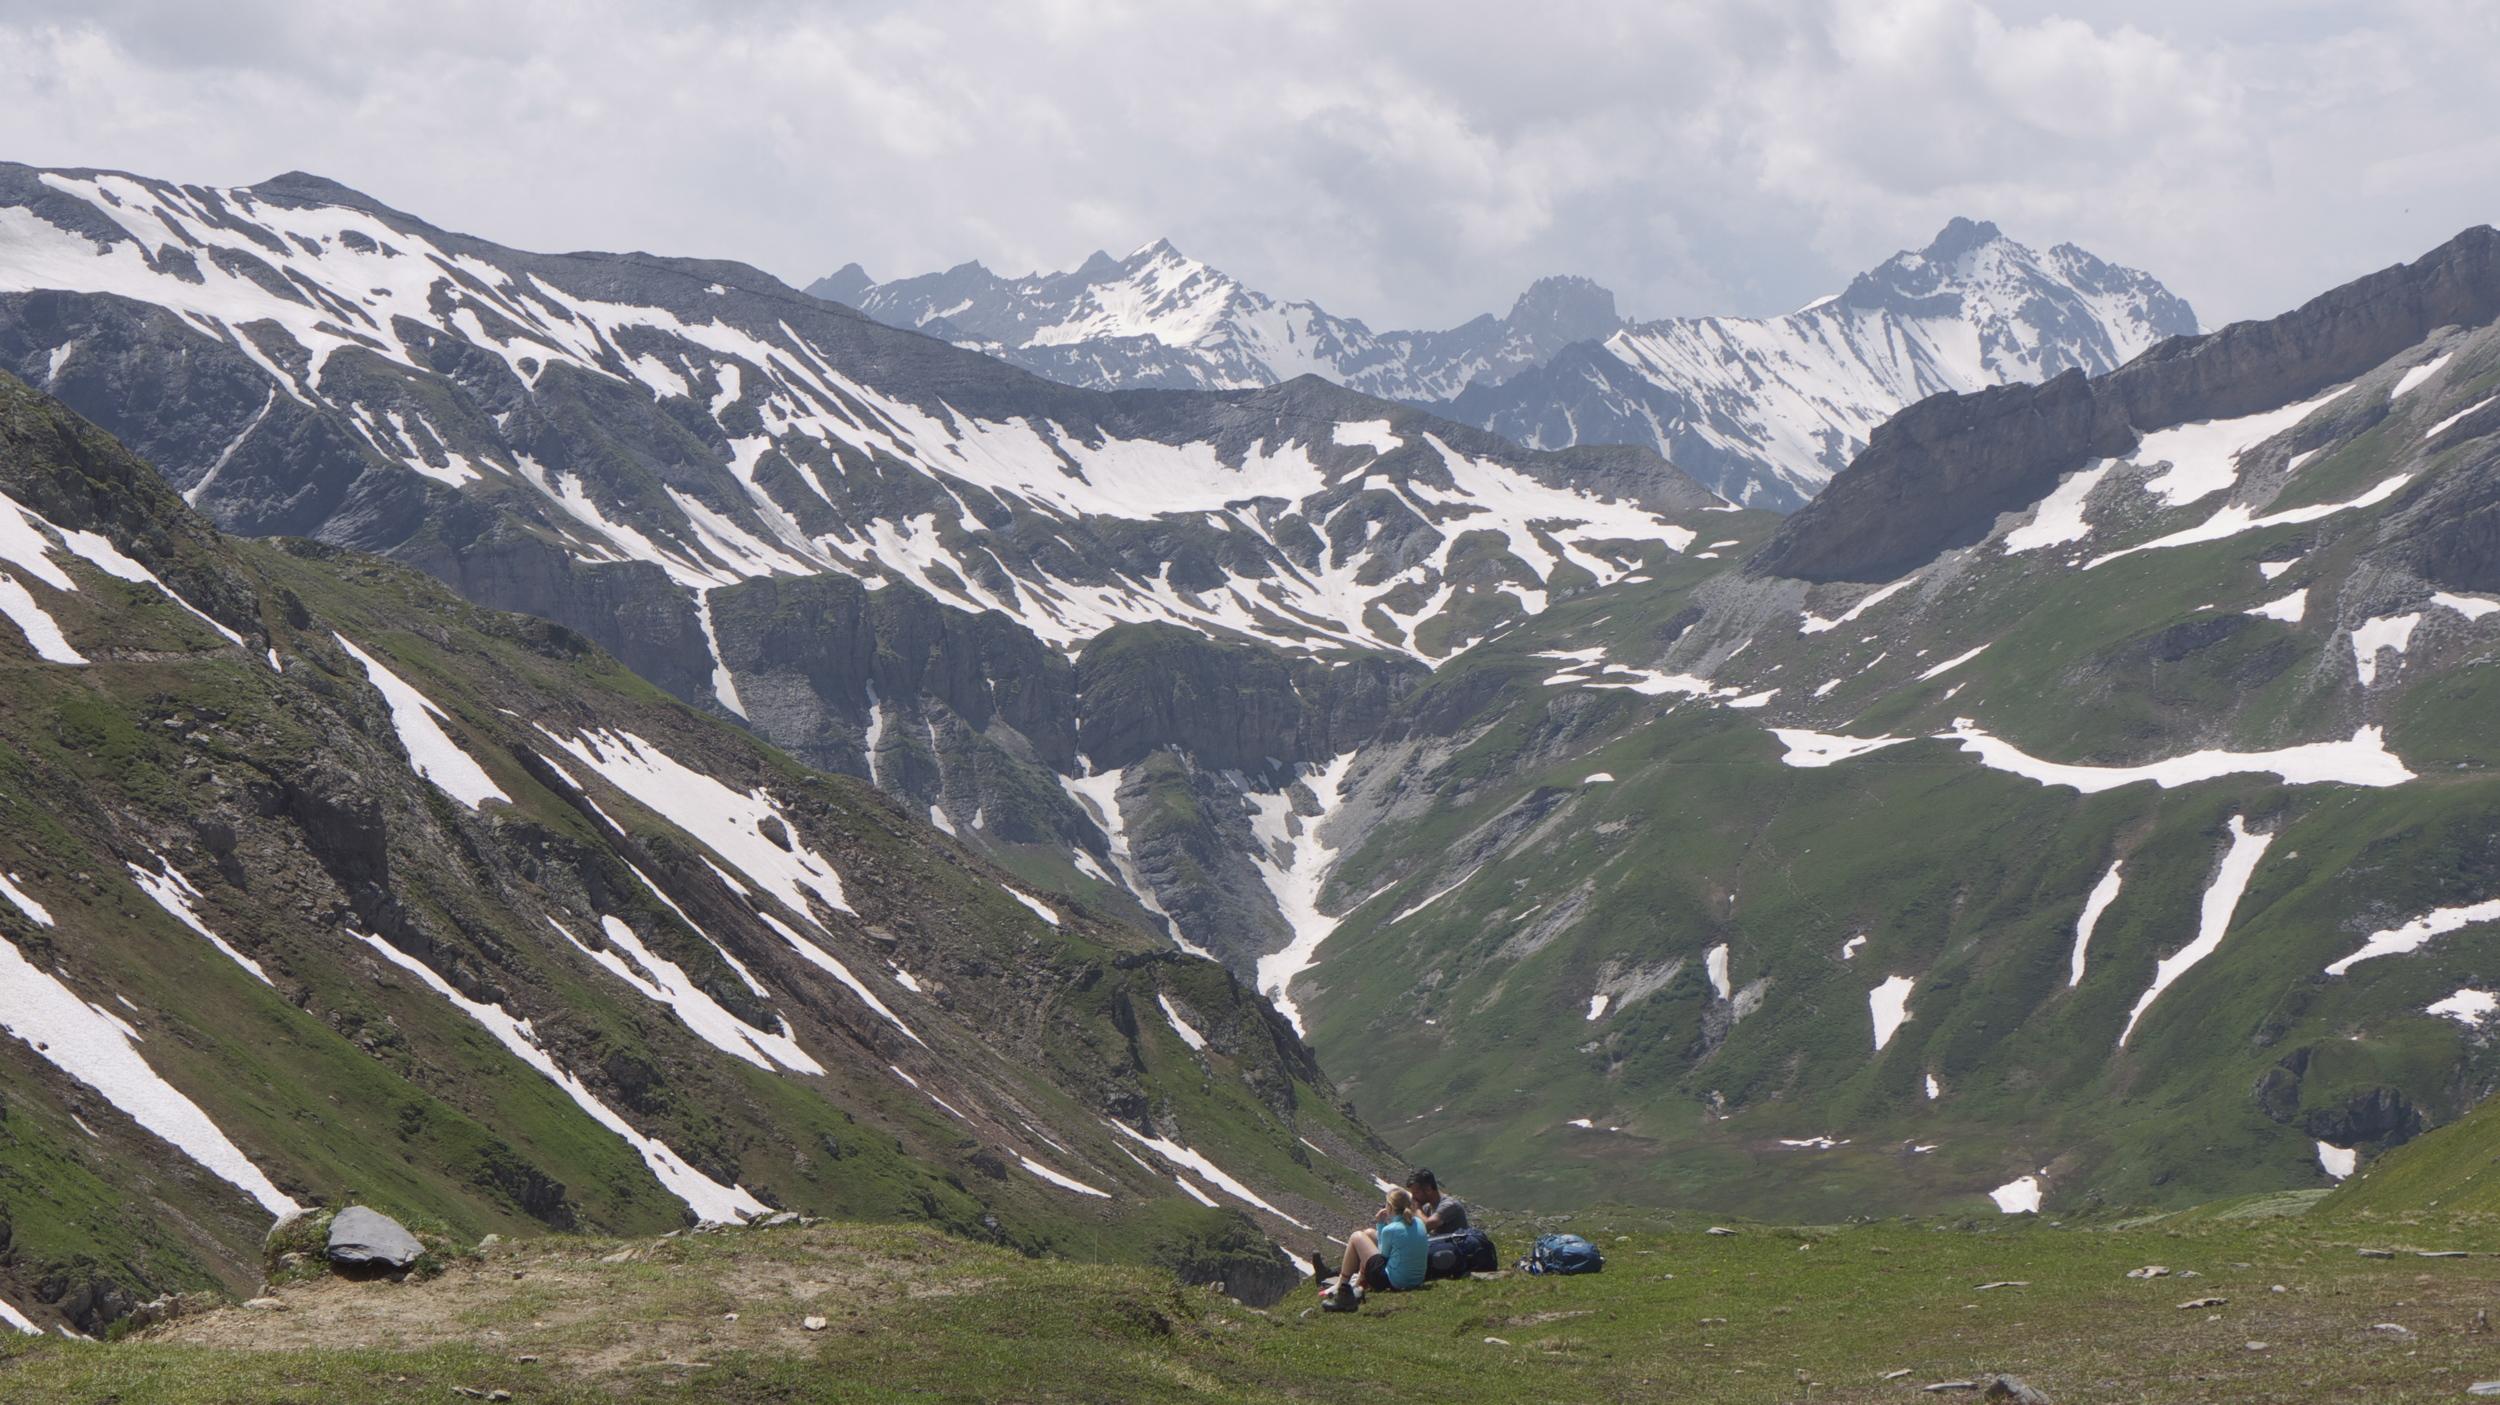 The Col du Bonhomme sits near the heart of the Reserve Naturel des Contamines-Montjoie.